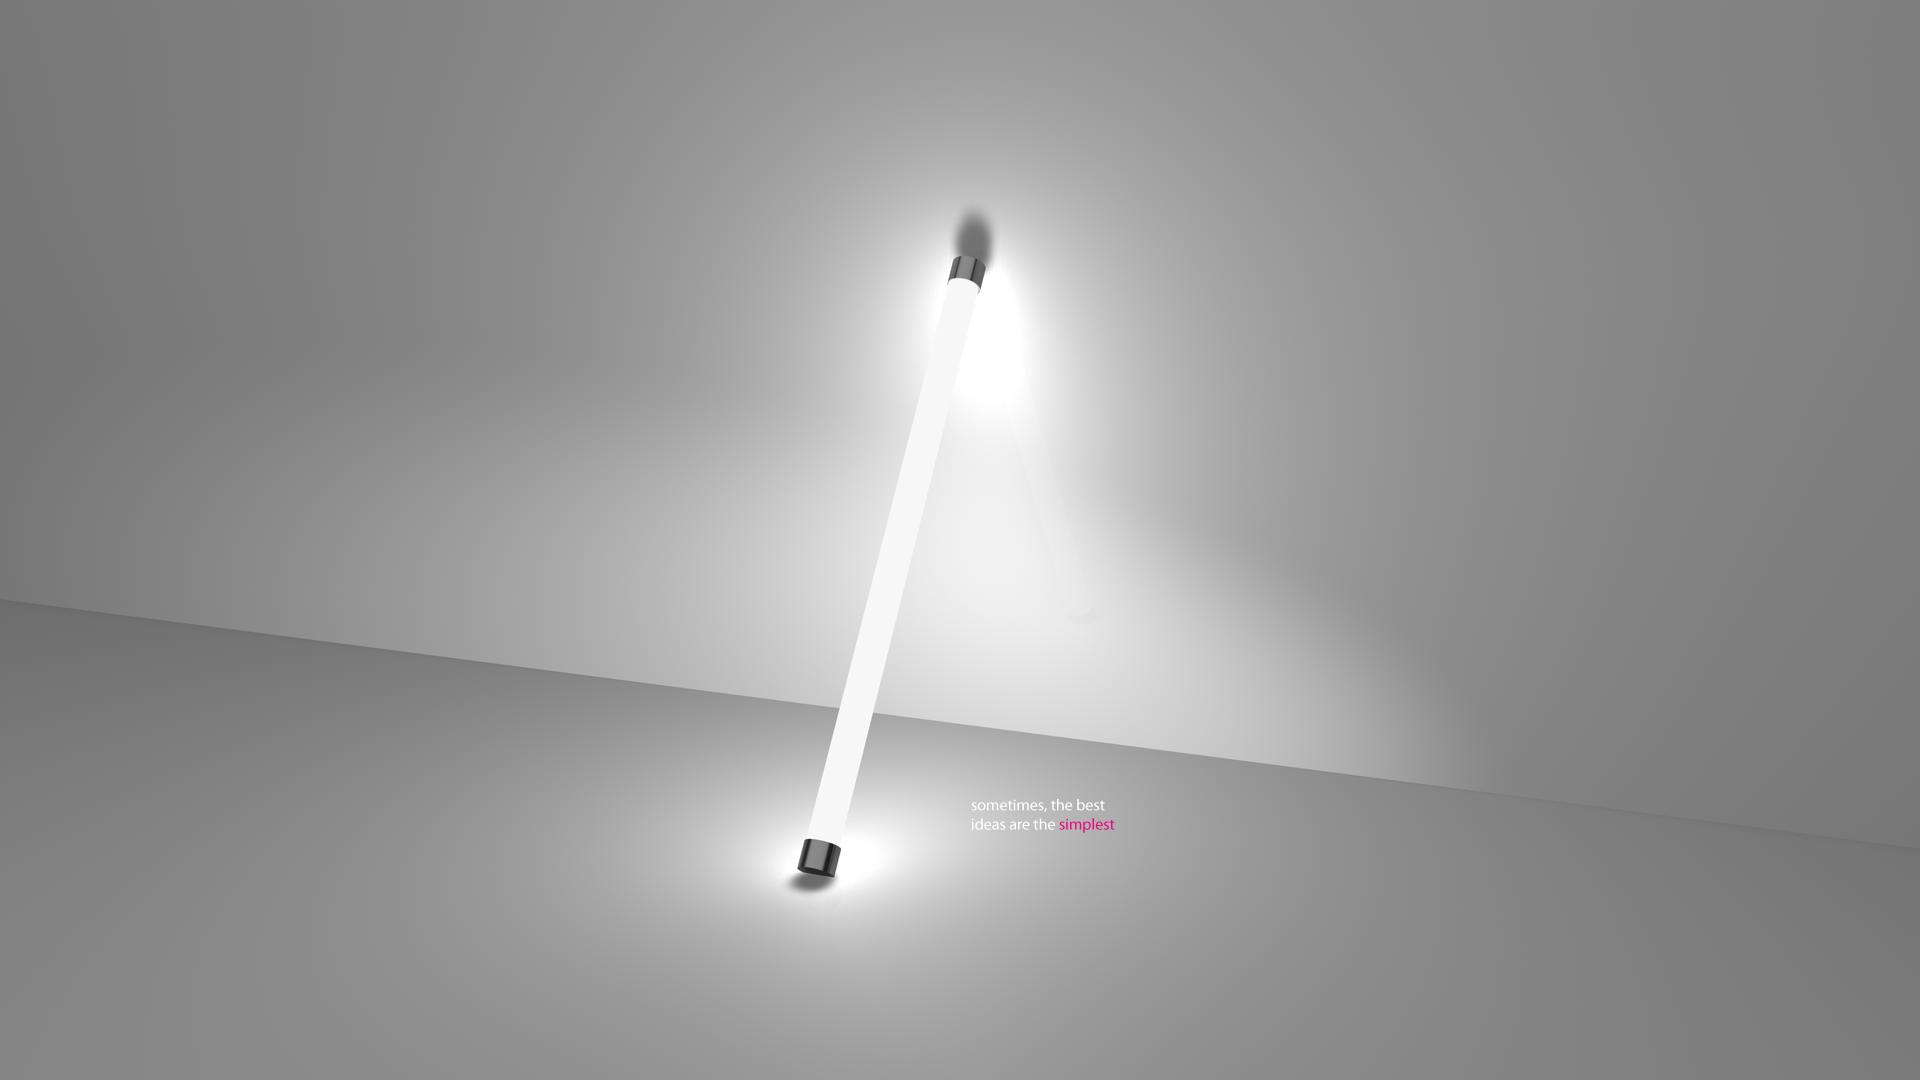 Light Bulb Idea Wallpapers Wide Light bulb